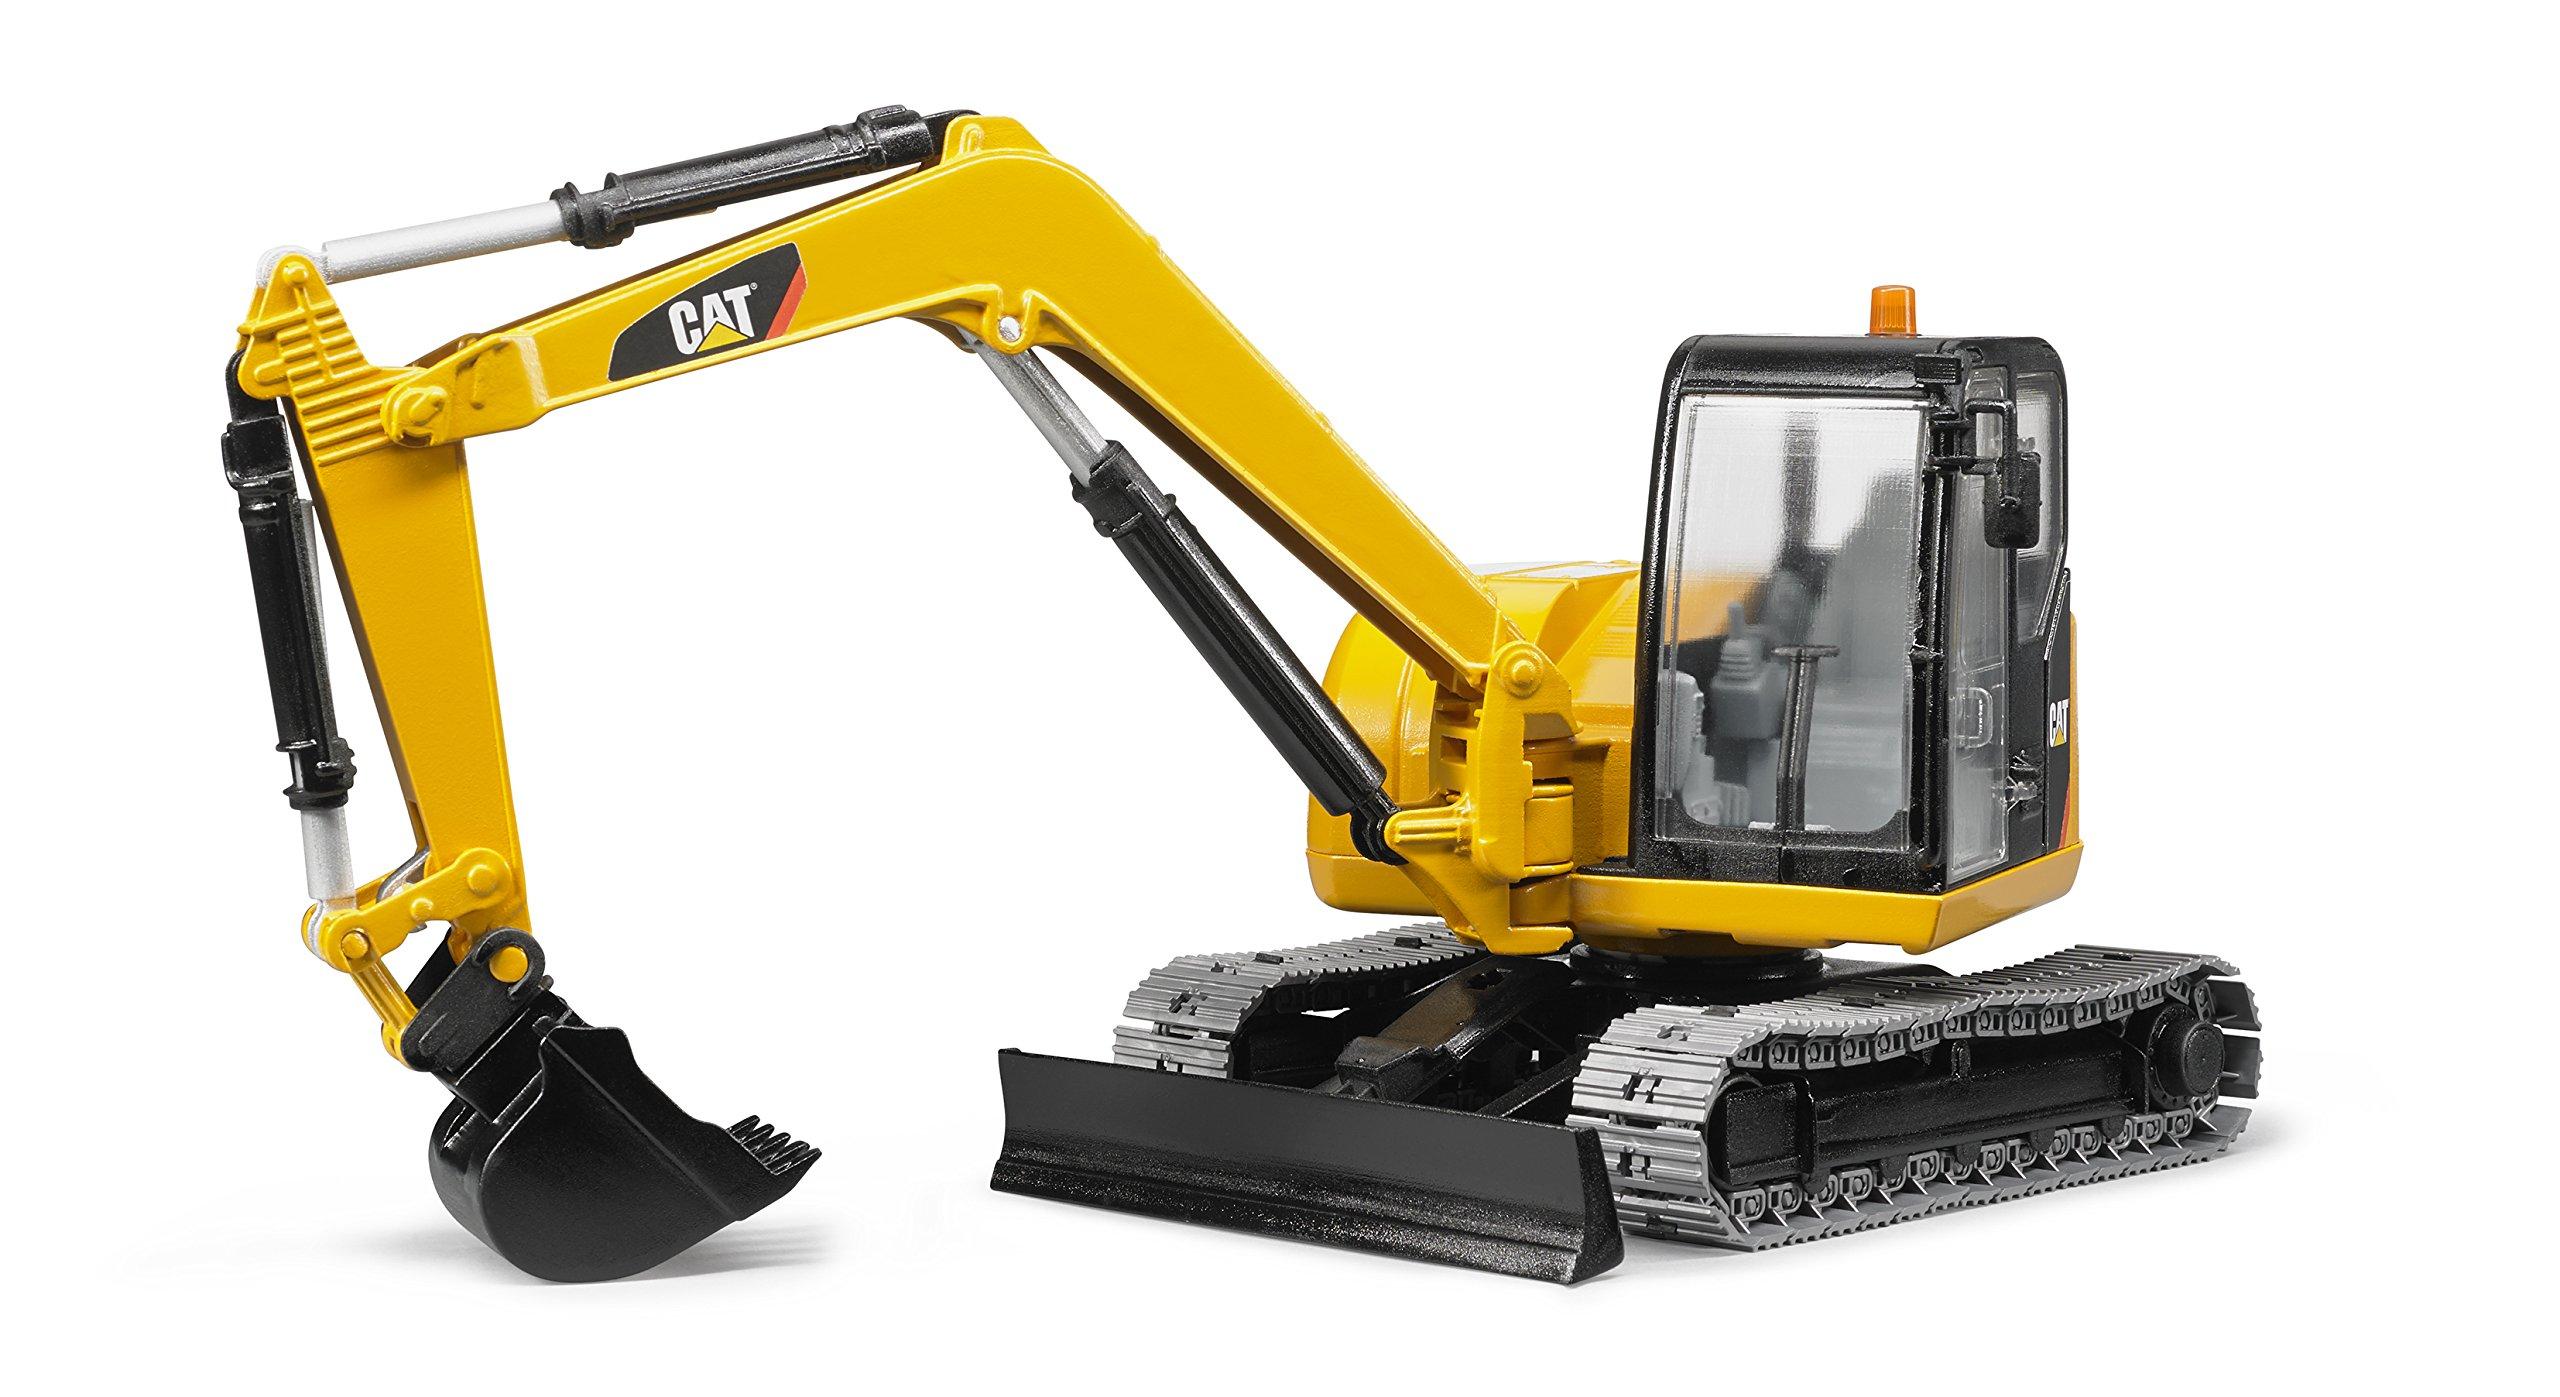 Bruder Toys CAT Mini Excavator Vehicle